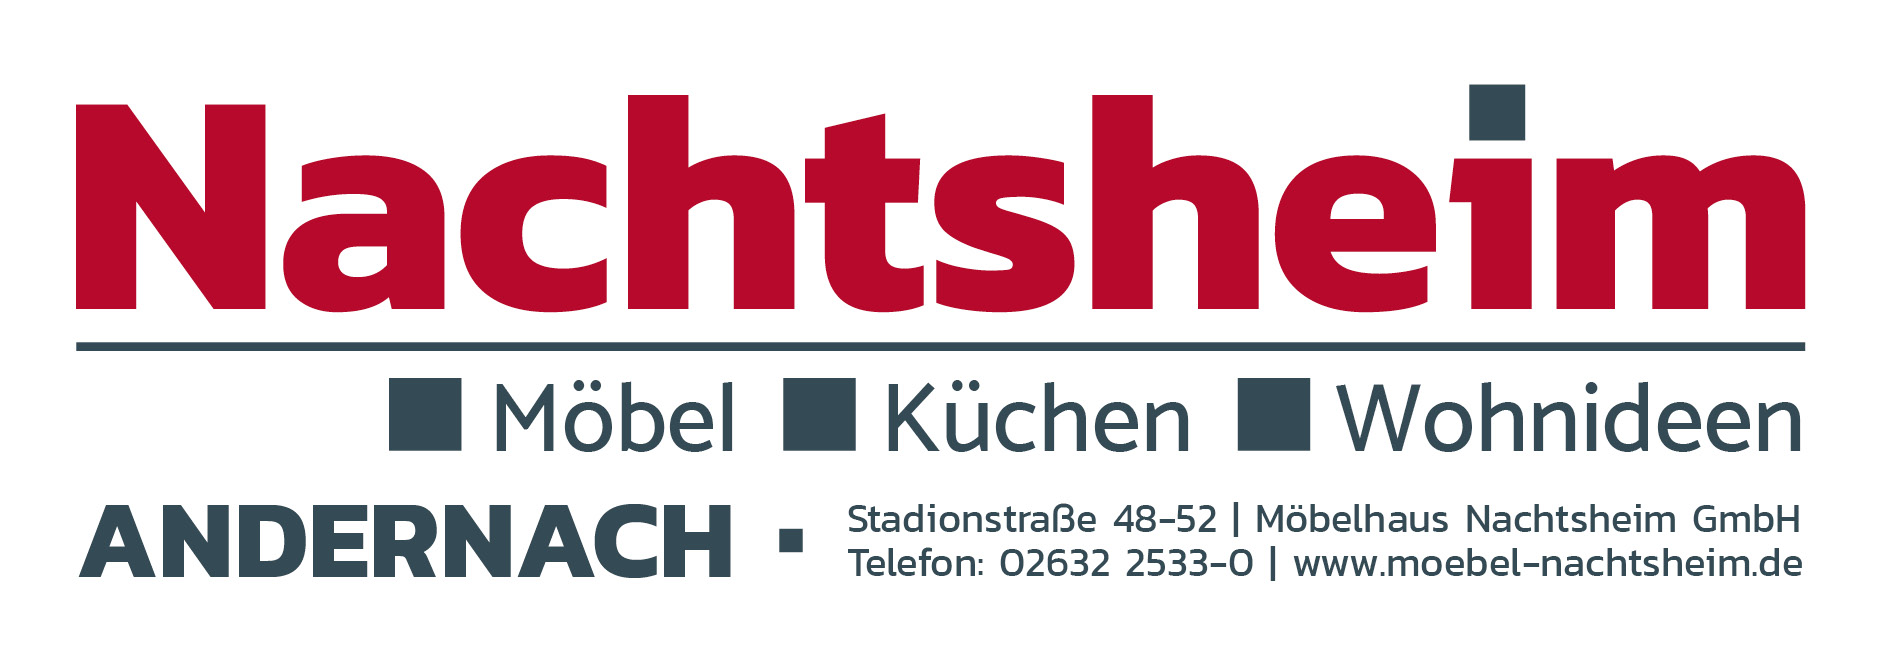 moebelhaus-nachtsheim-gmbh-andernach logo